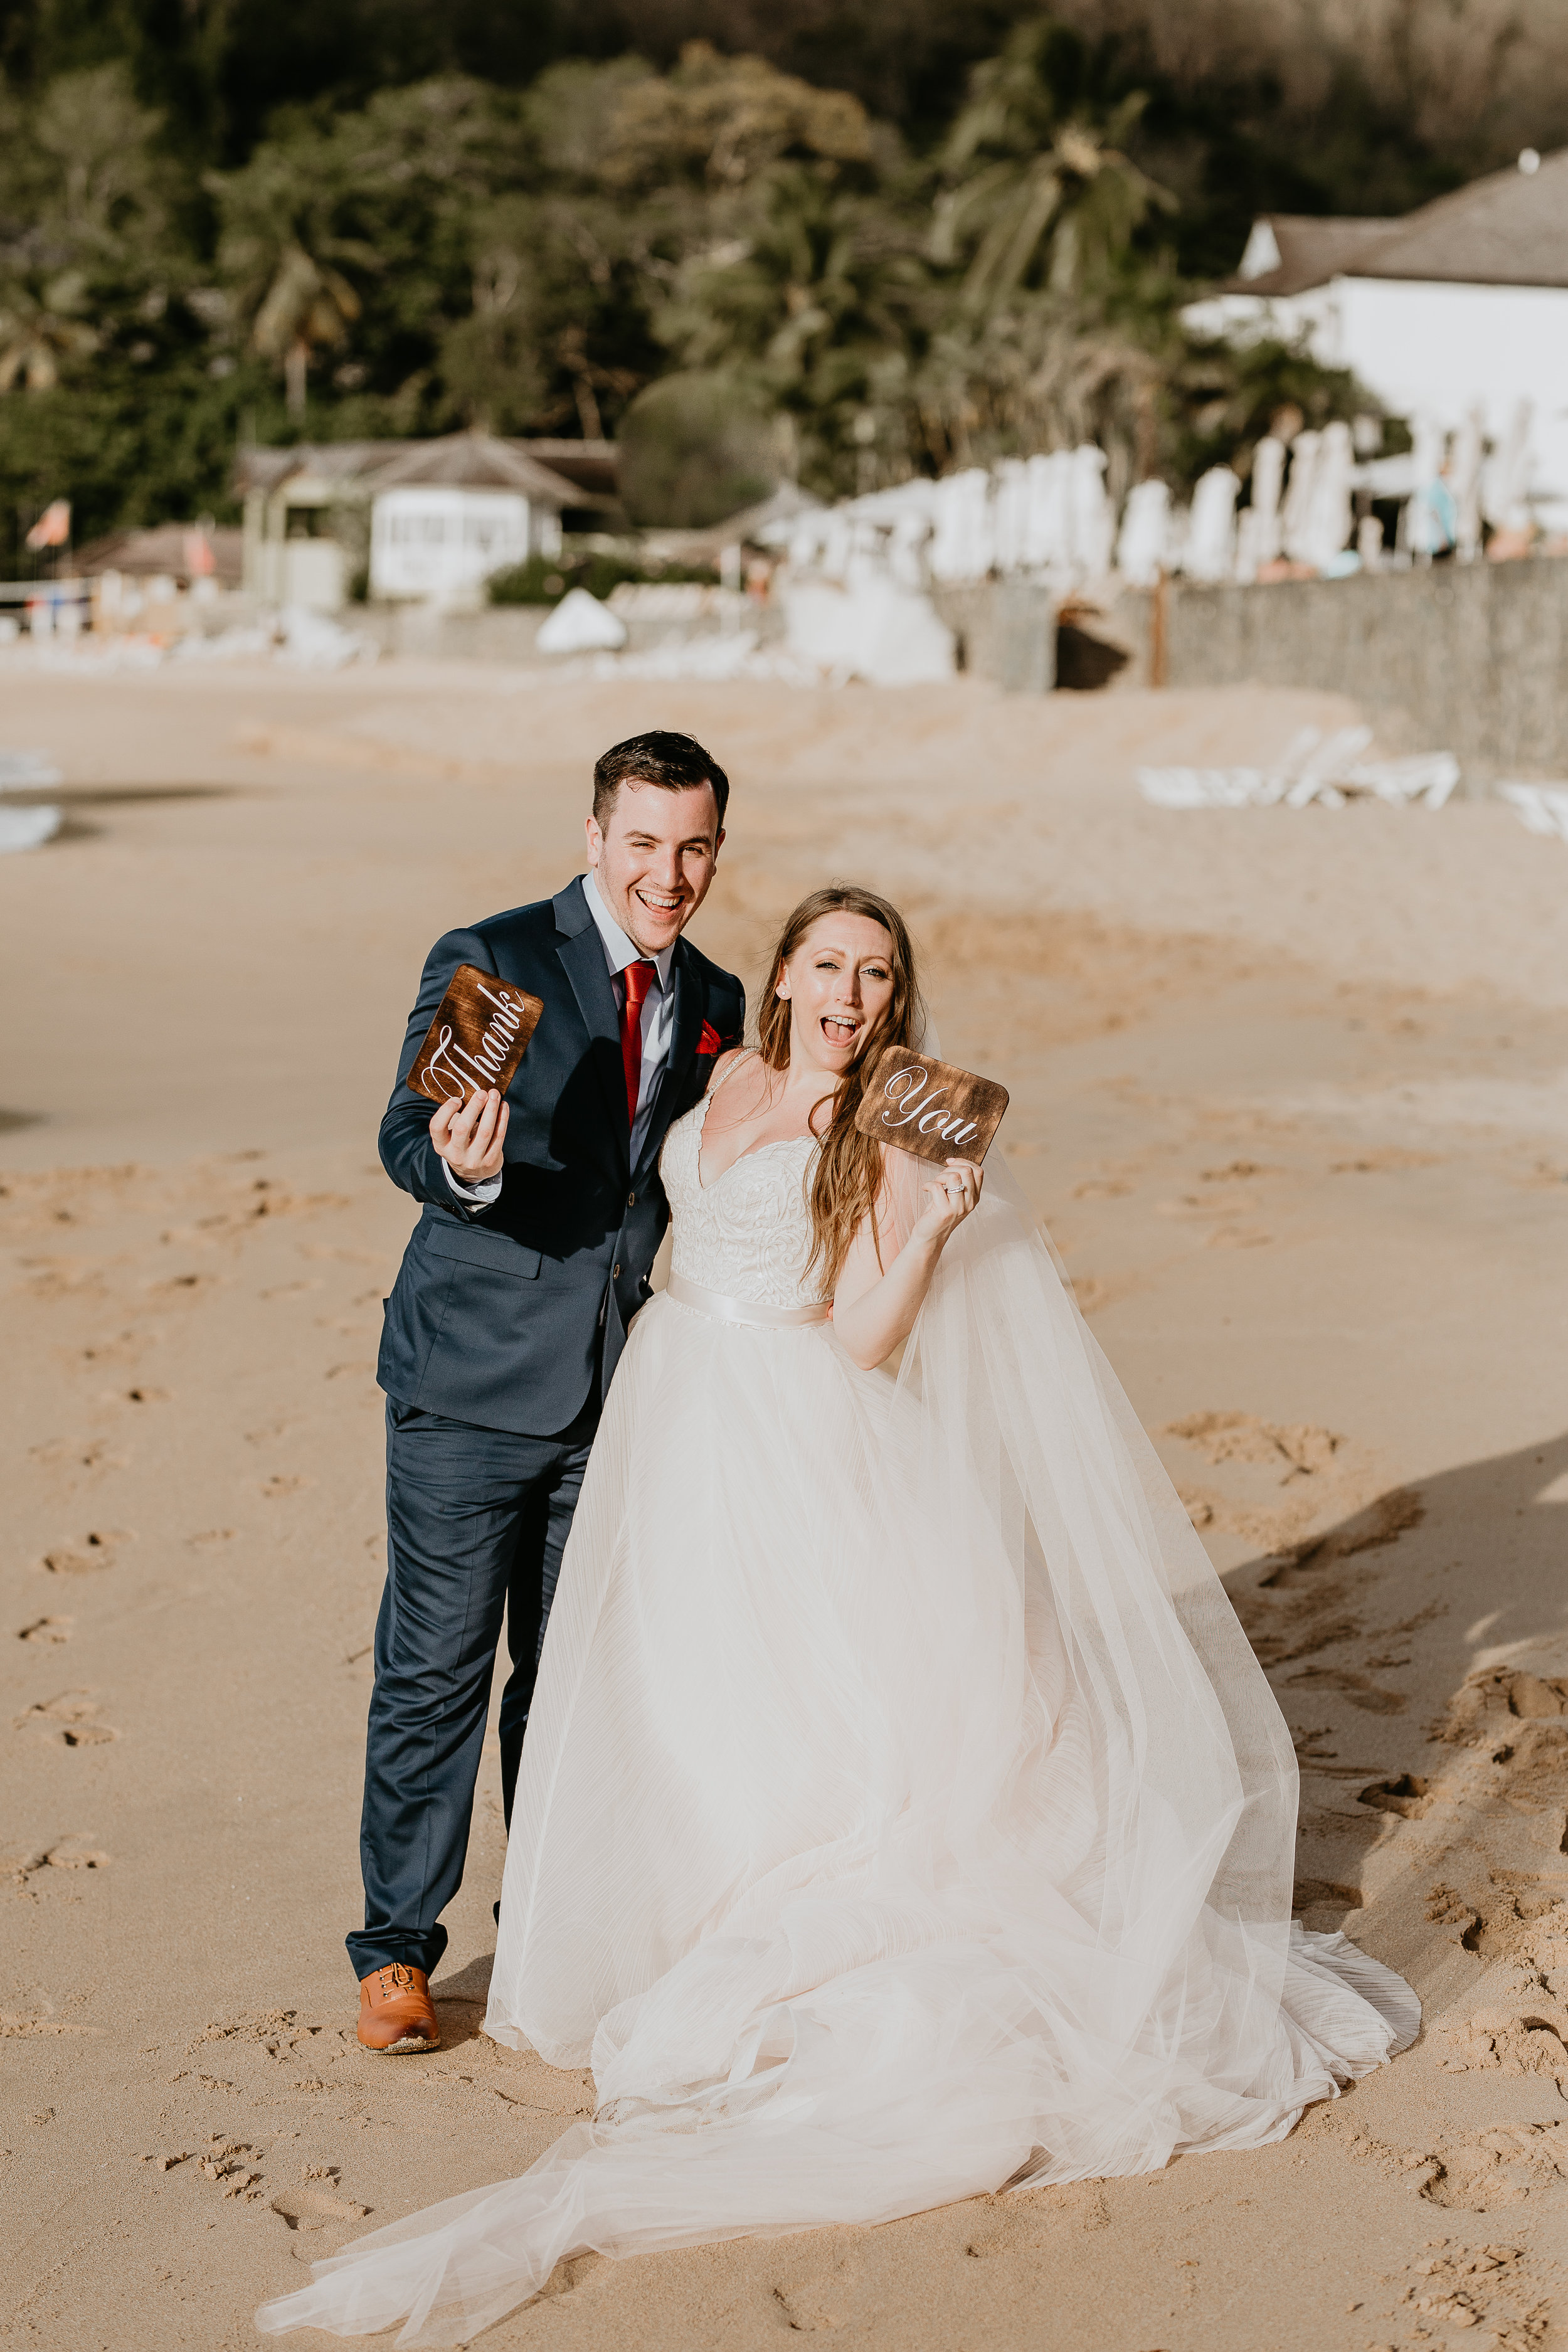 nicole-daacke-photography-destination-wedding-in-st-lucia-sandals-la-toc-intimate-island-wedding-carribean-elopement-photographer-chill-island-wedding-97.jpg